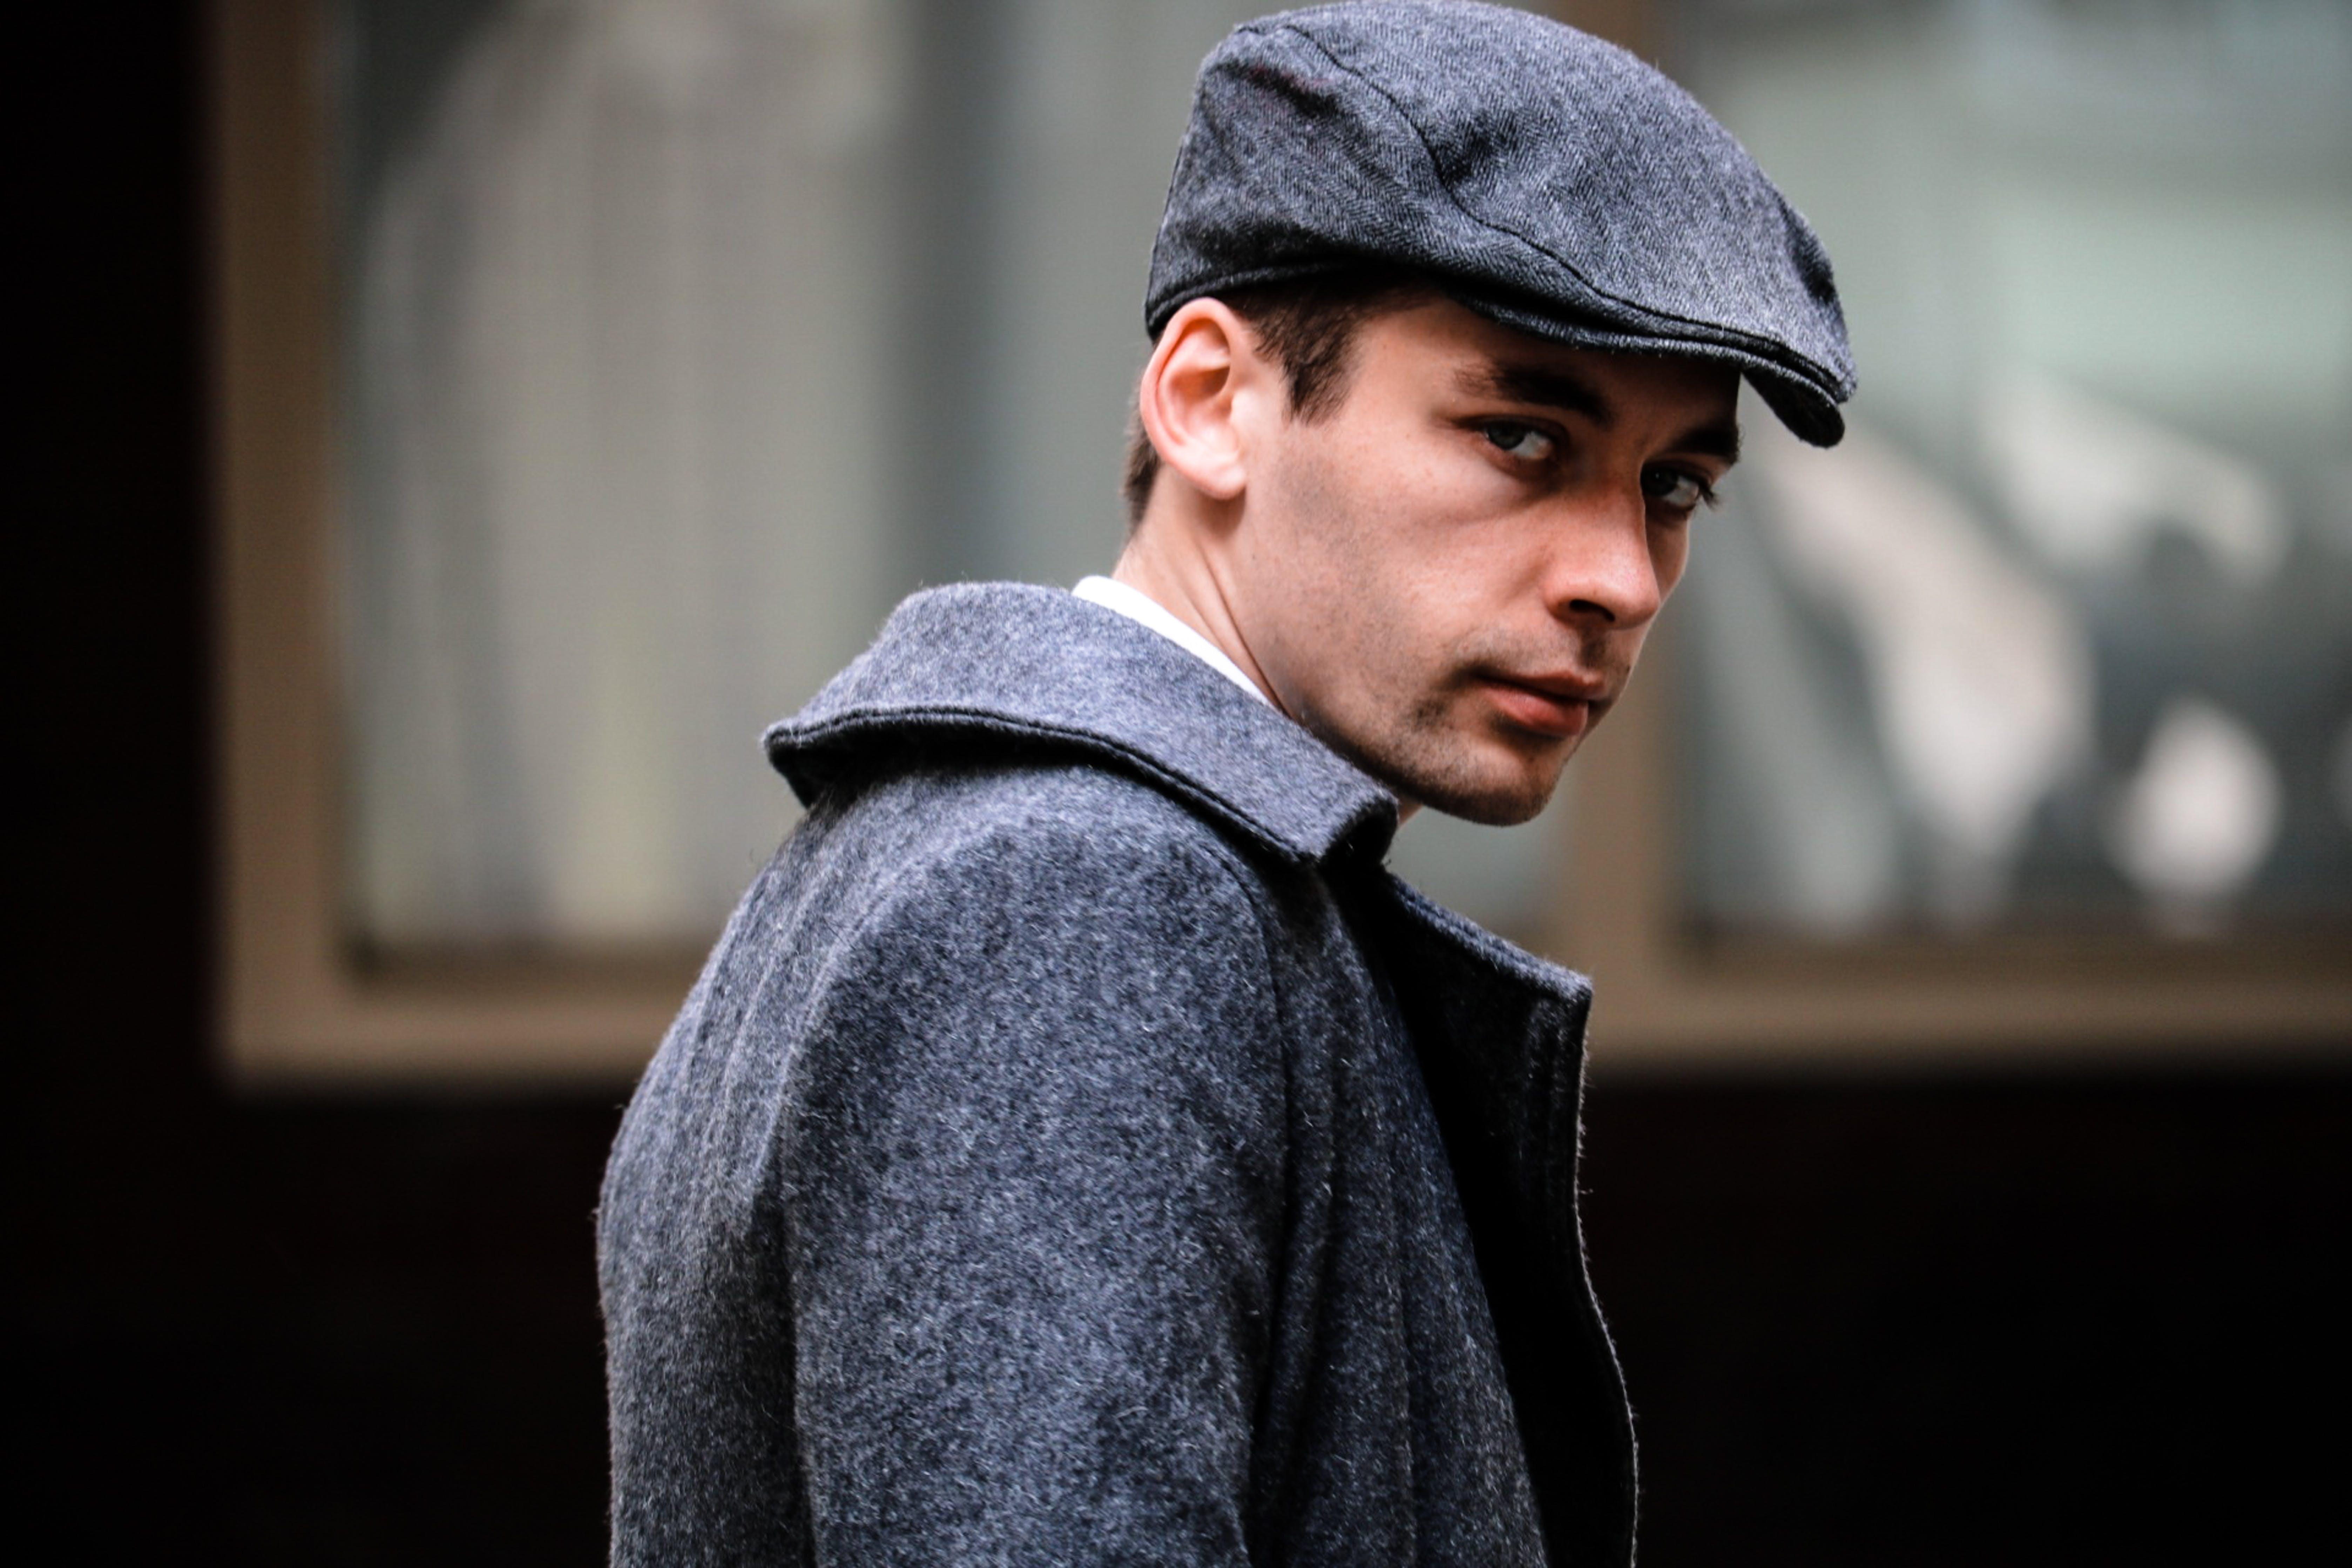 Man in Gray Coat Photo